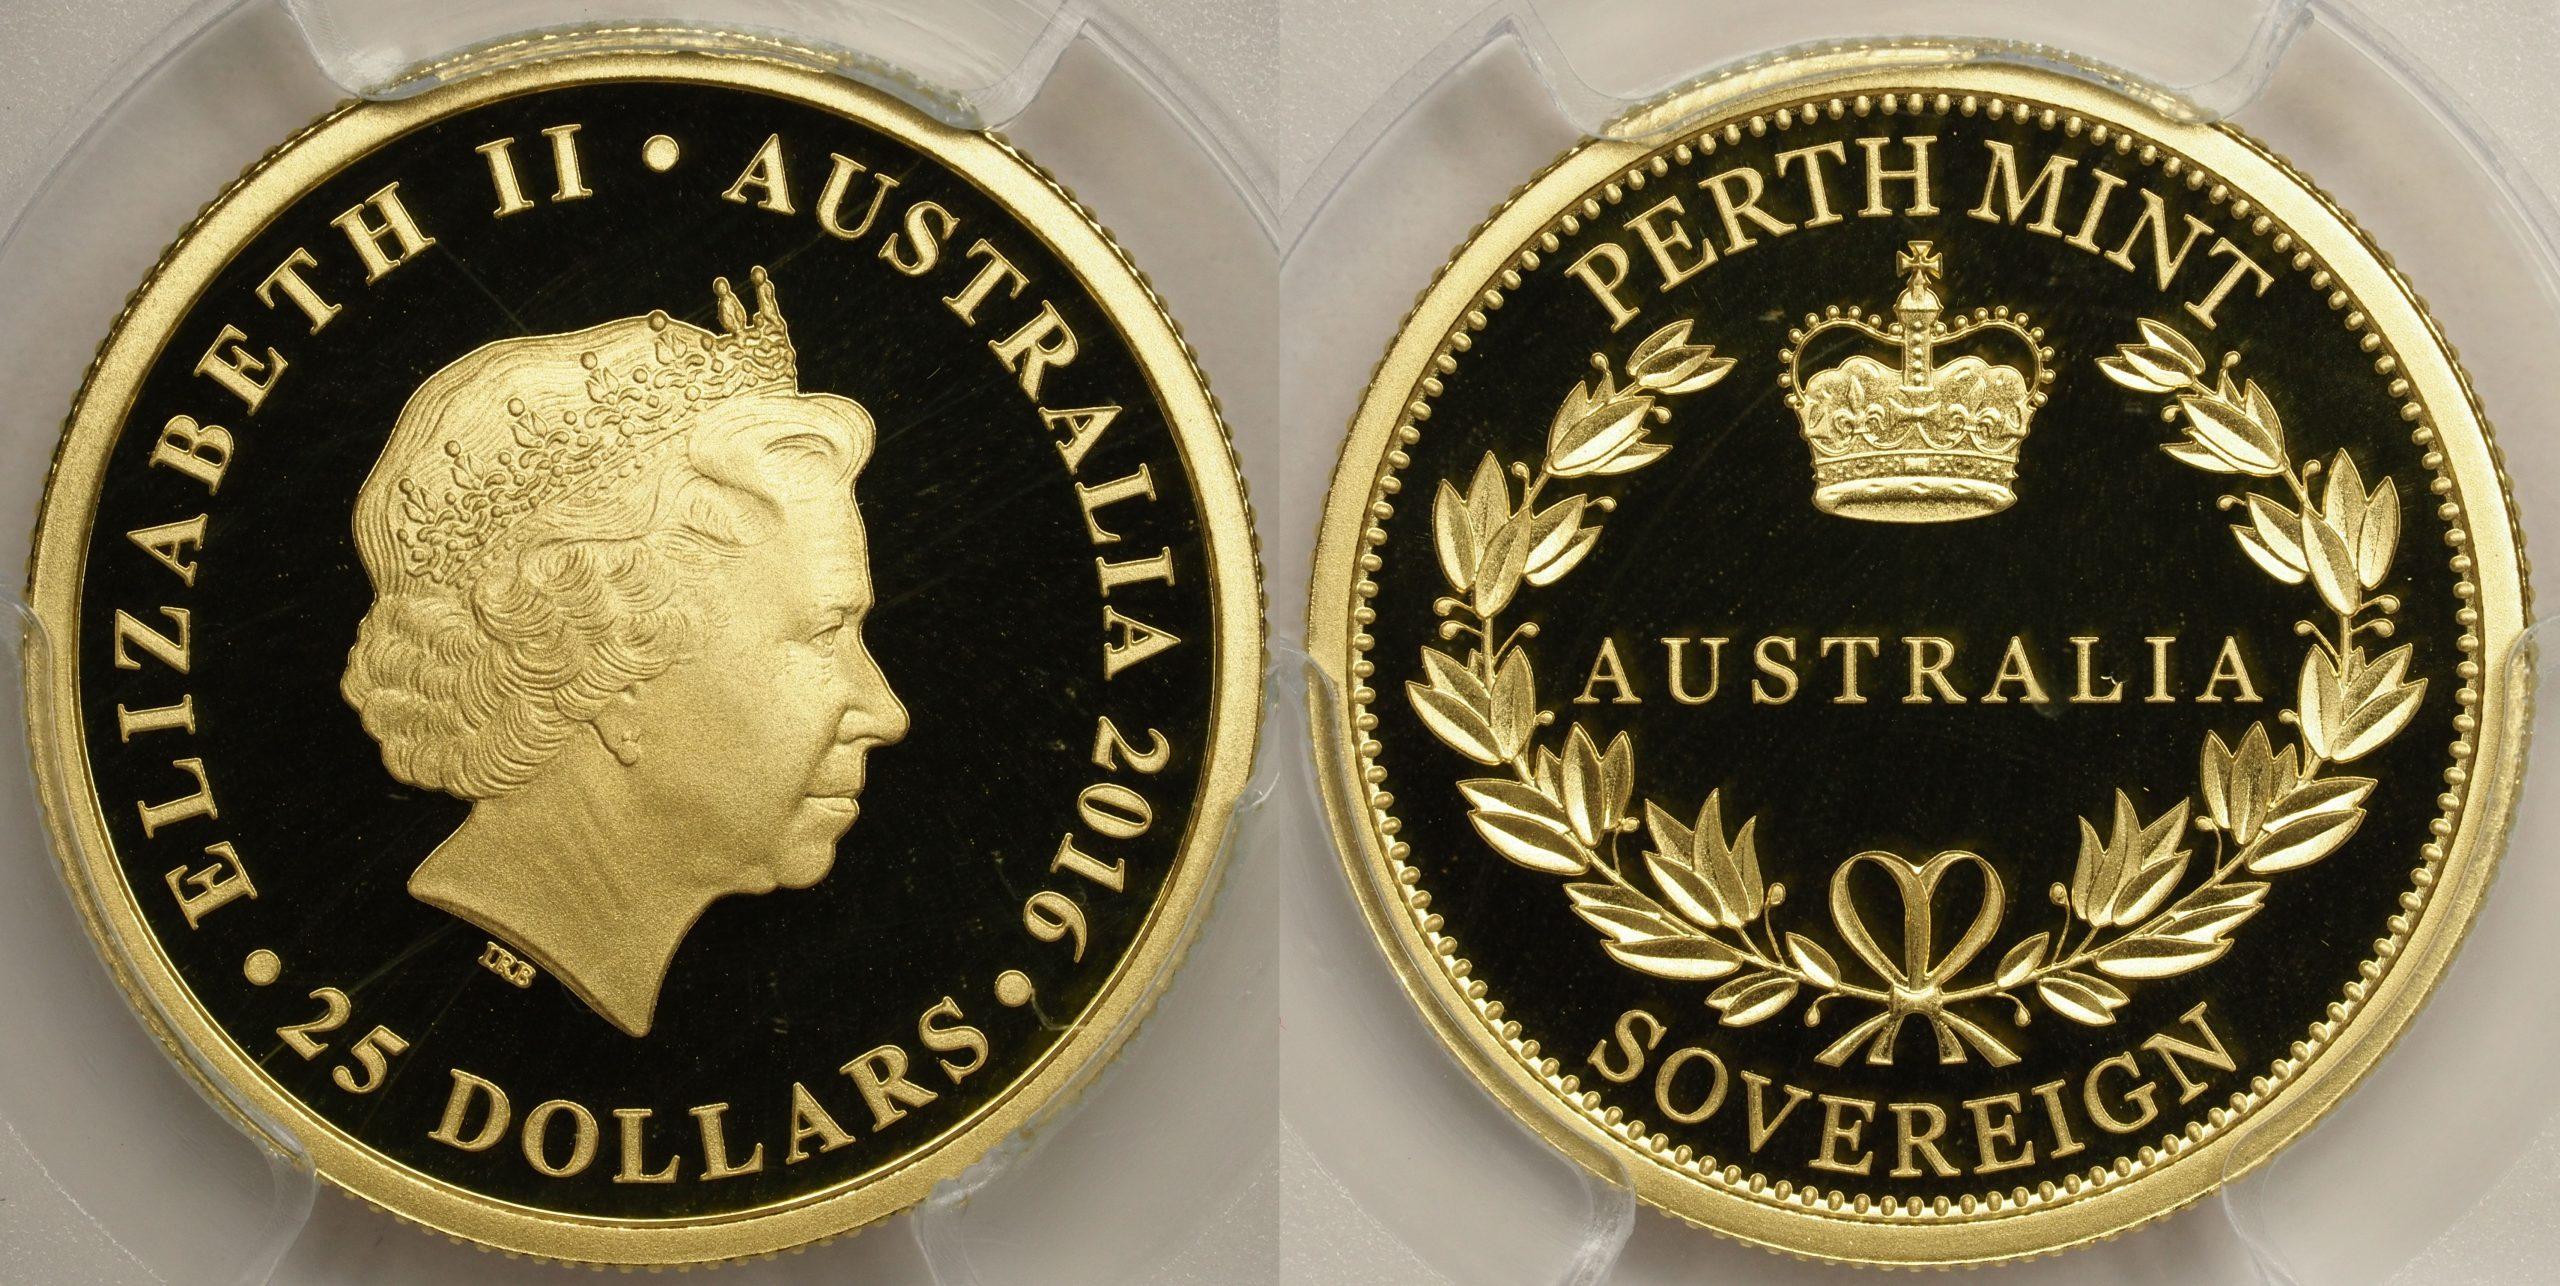 Australia 2016 Perth Mint $25 Sovereign PCGS PR69